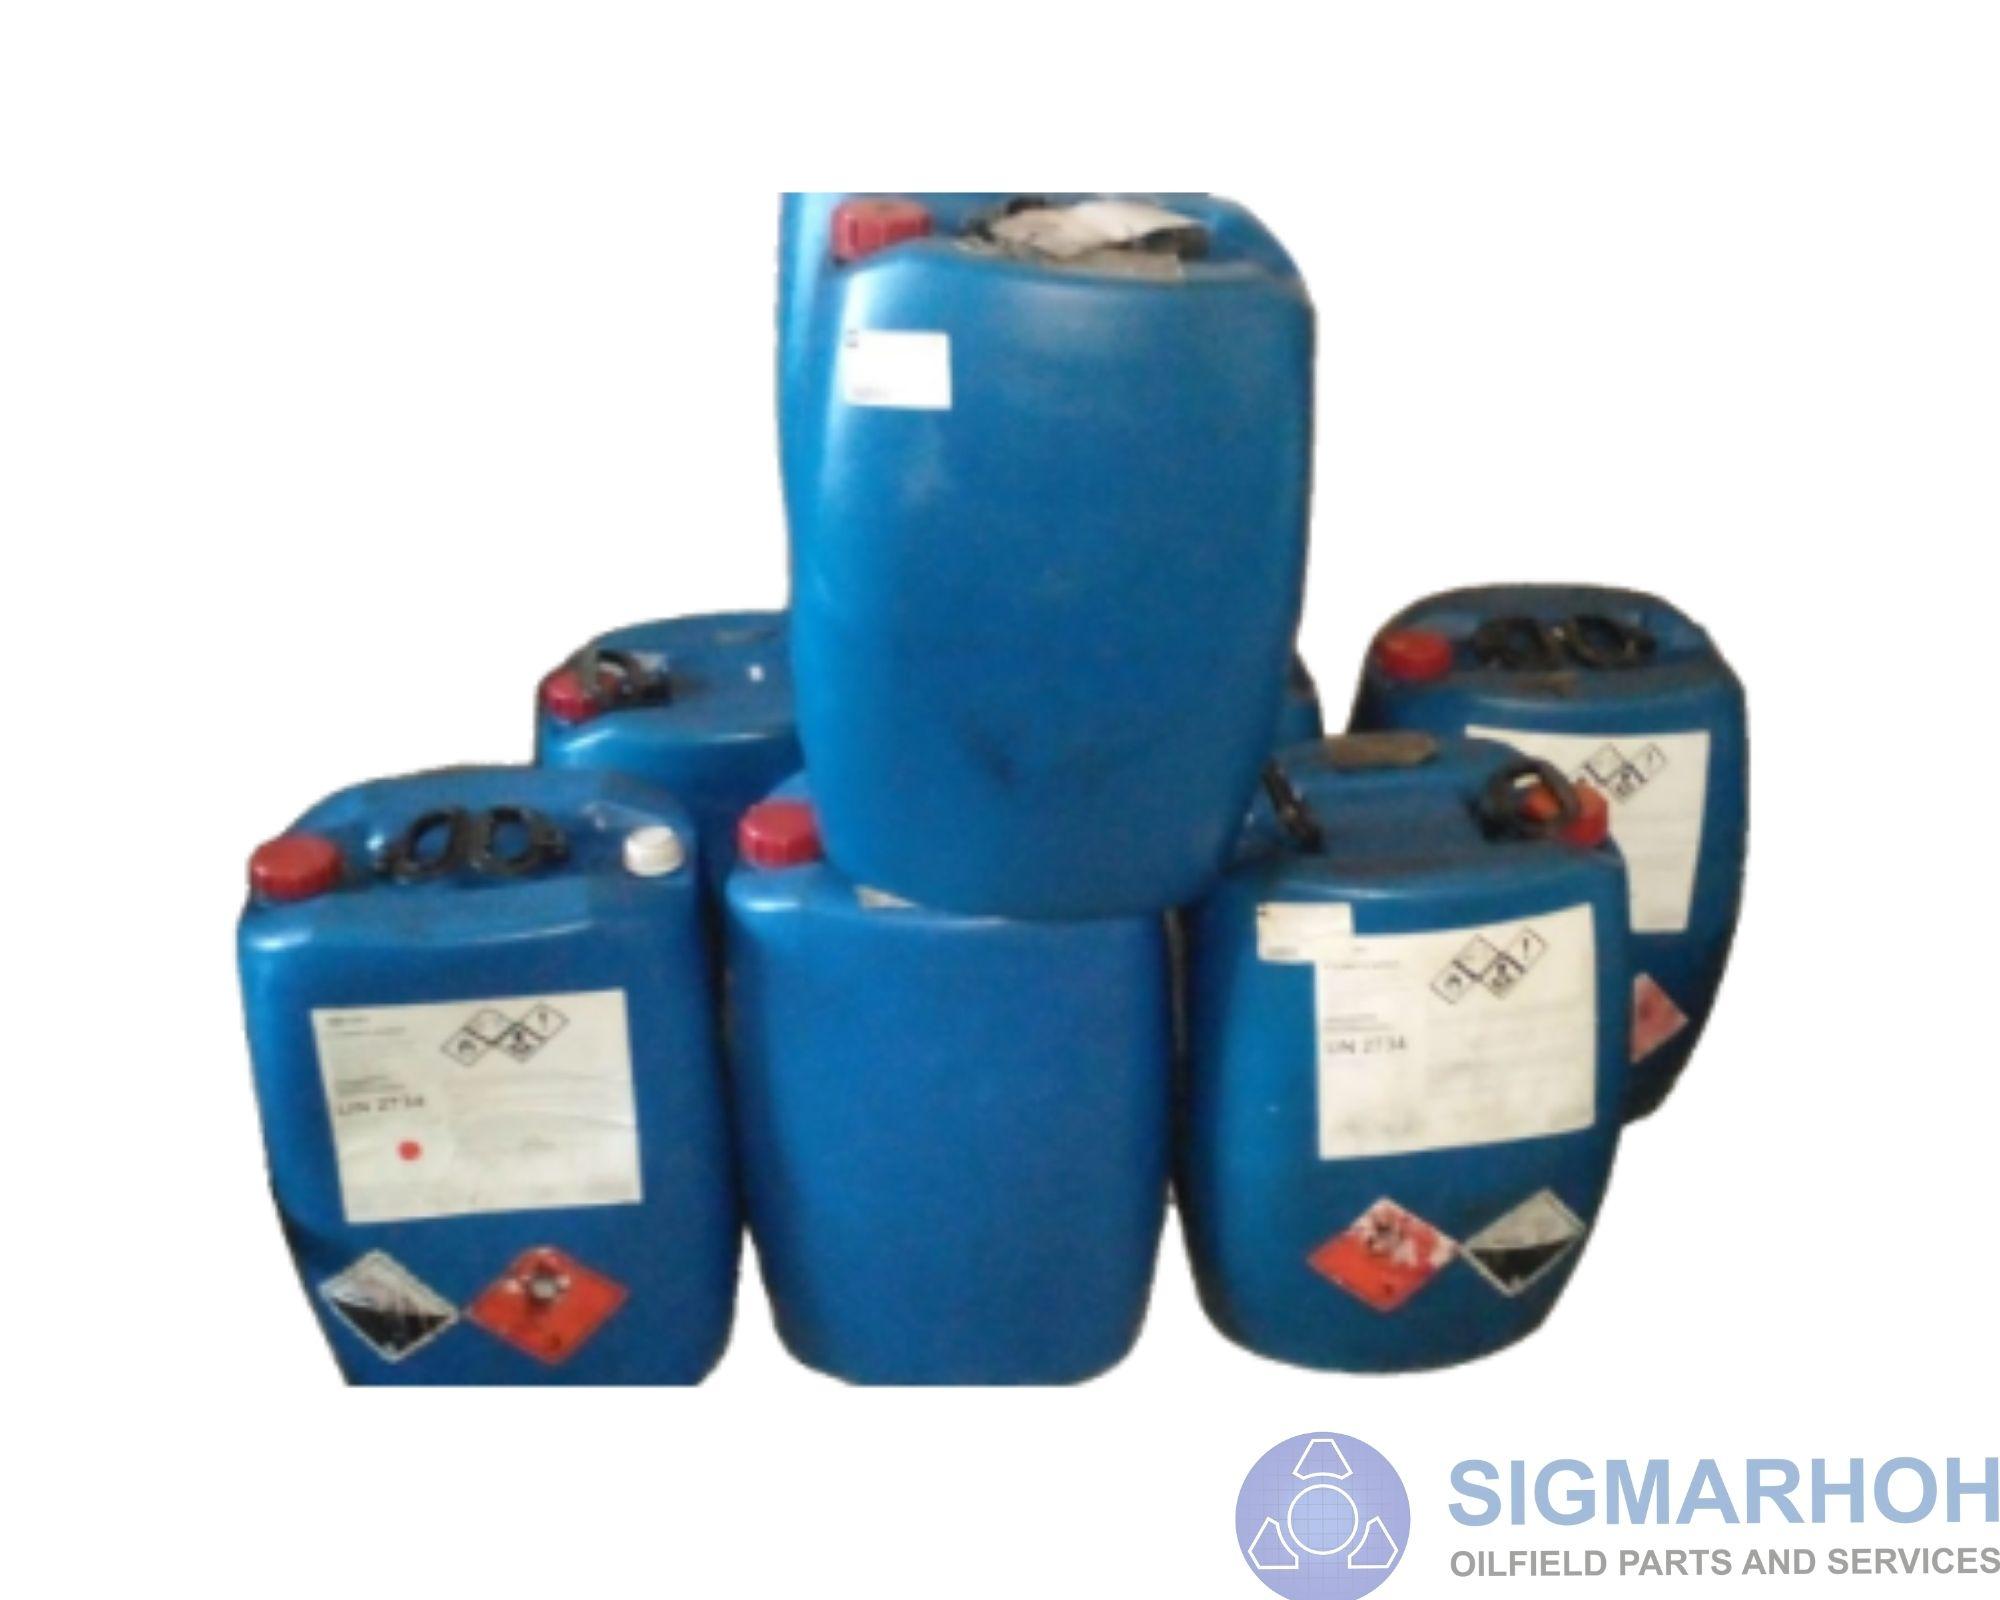 Inibidor de Corrosão SEAMATE 0520 / Corrosion Inhibitor SEAMATE 0520